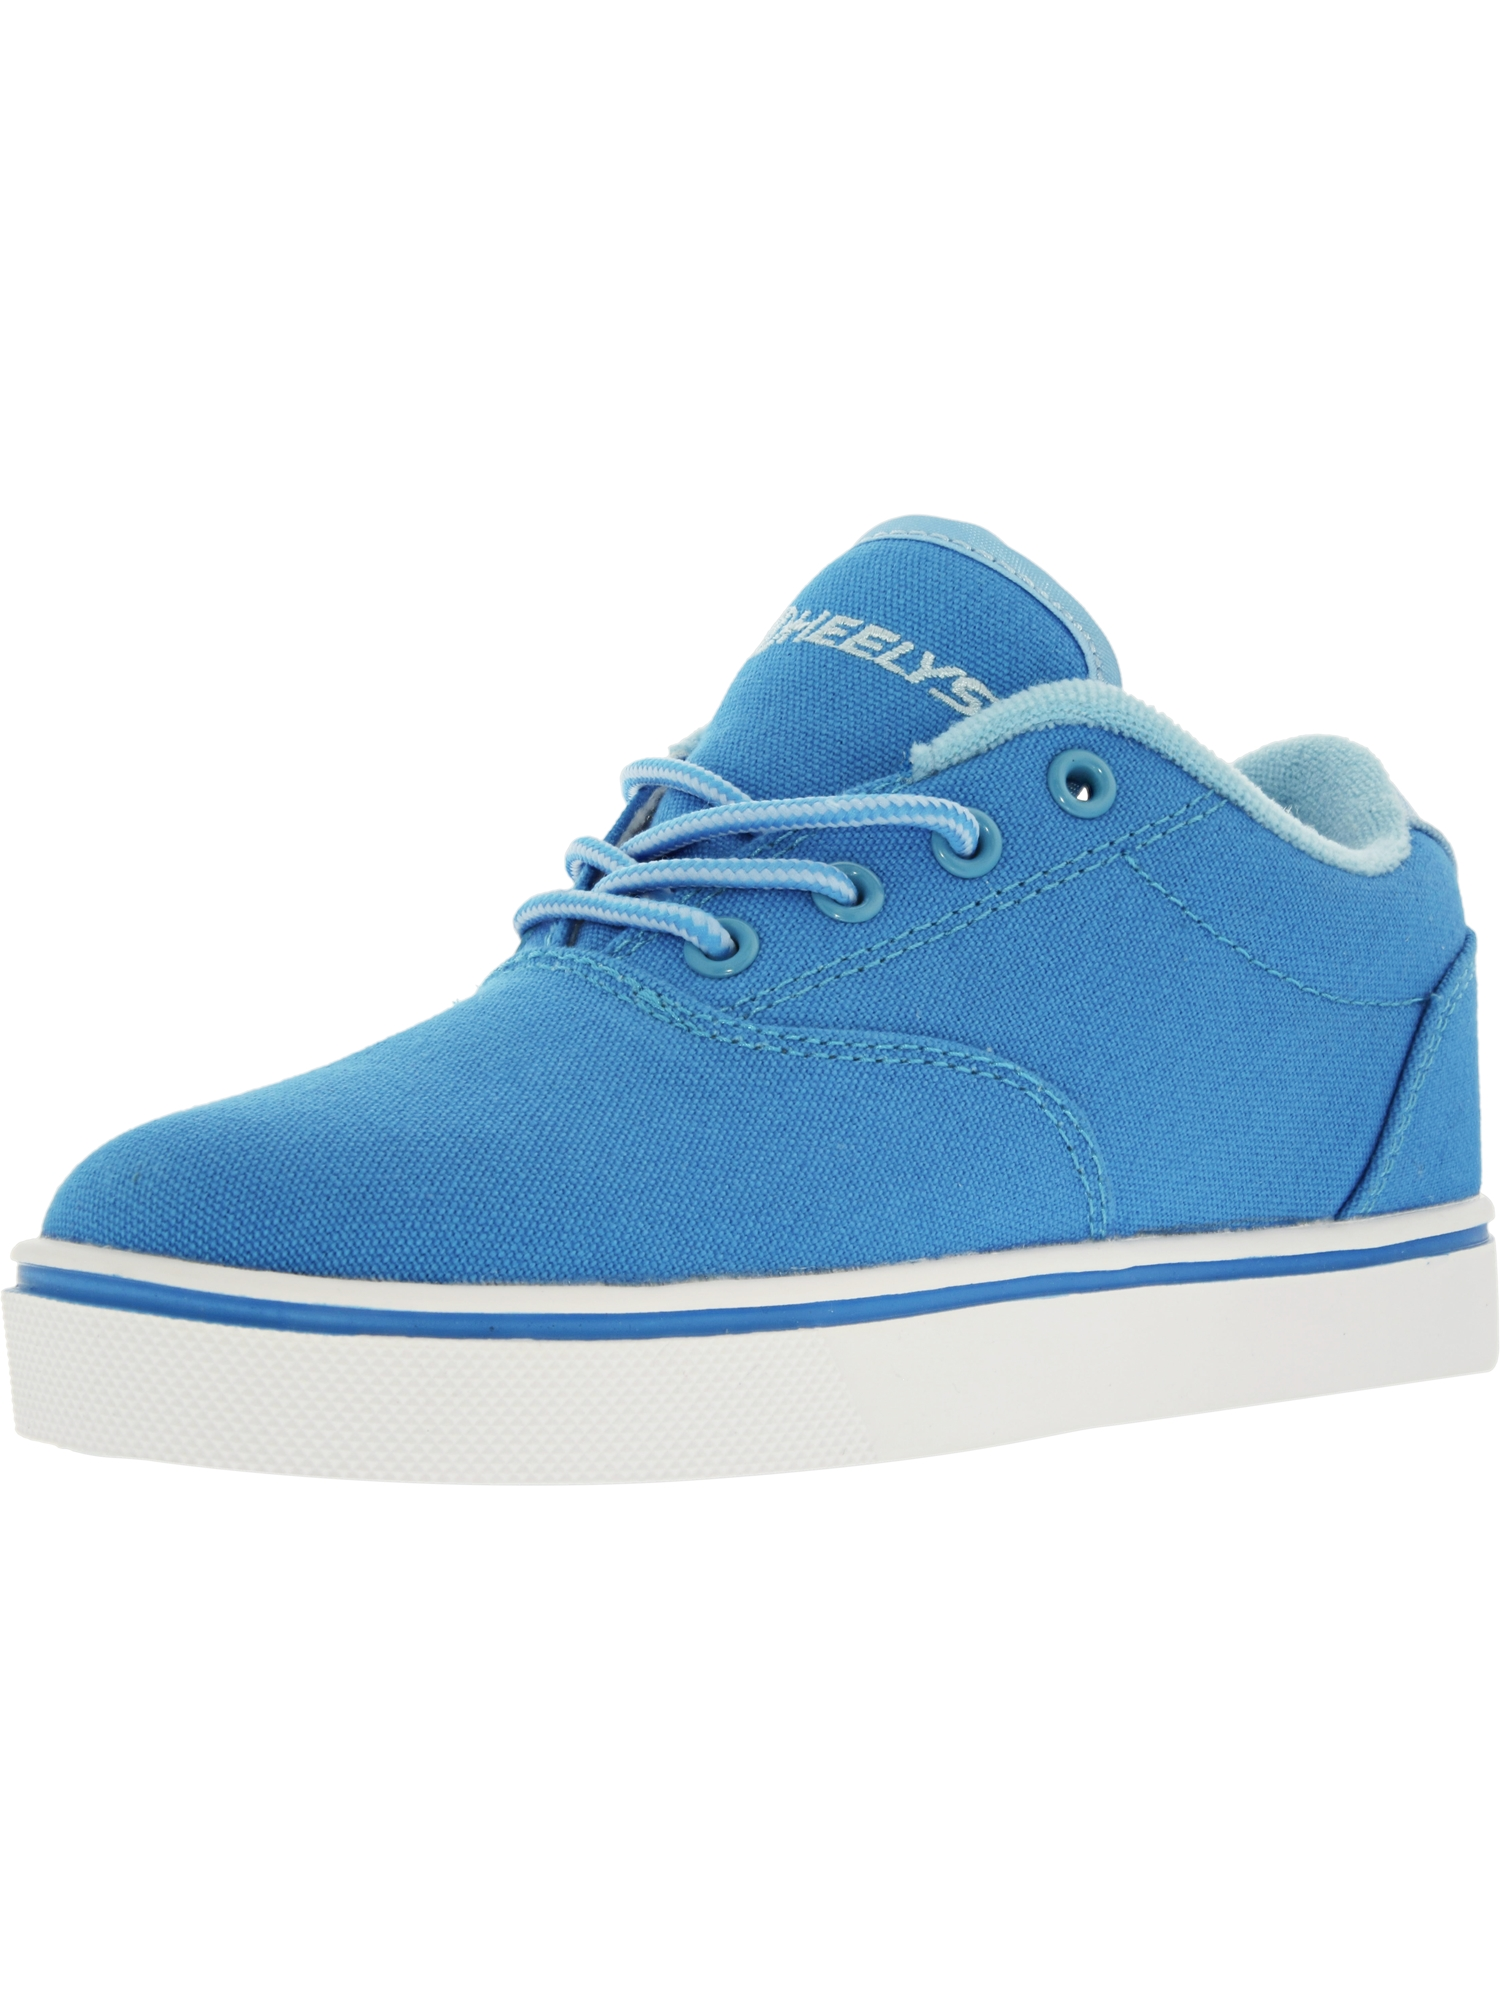 Heelys Launch Light Blue/Blue/White Ankle-High Fashion Sneaker - 7M